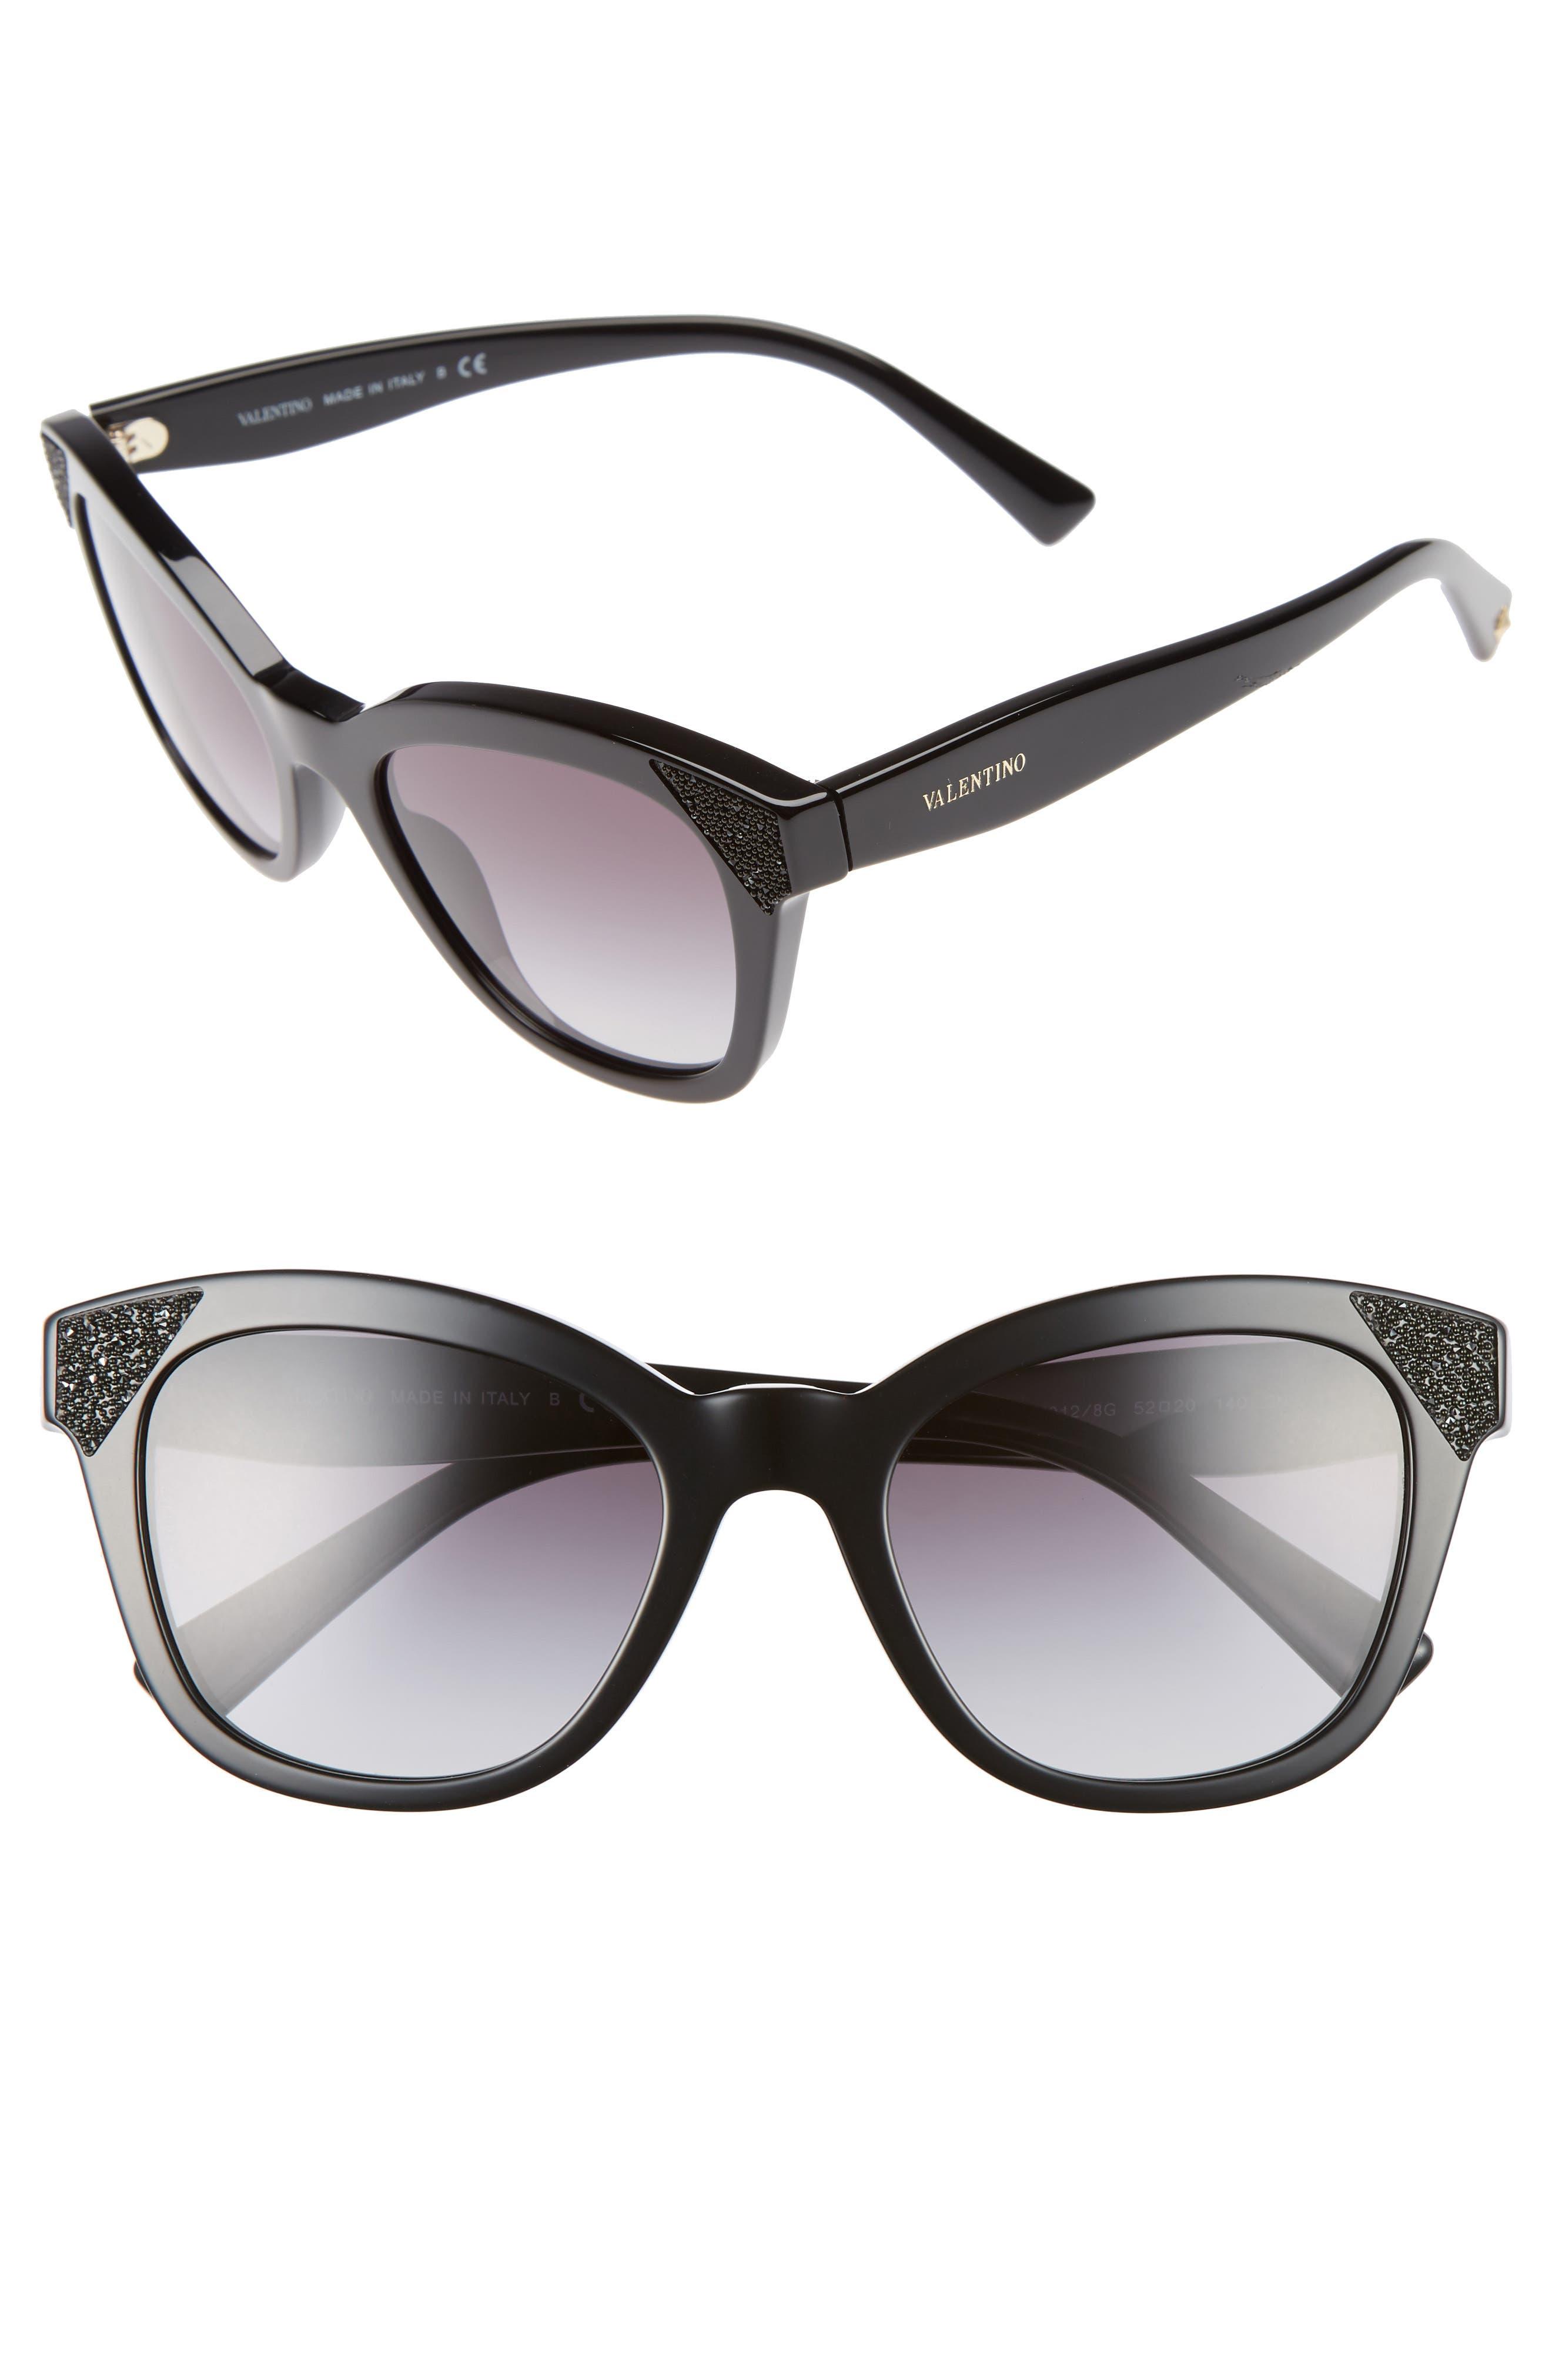 52mm Cat Eye Sunglasses,                             Main thumbnail 1, color,                             Black/ Black Crystal